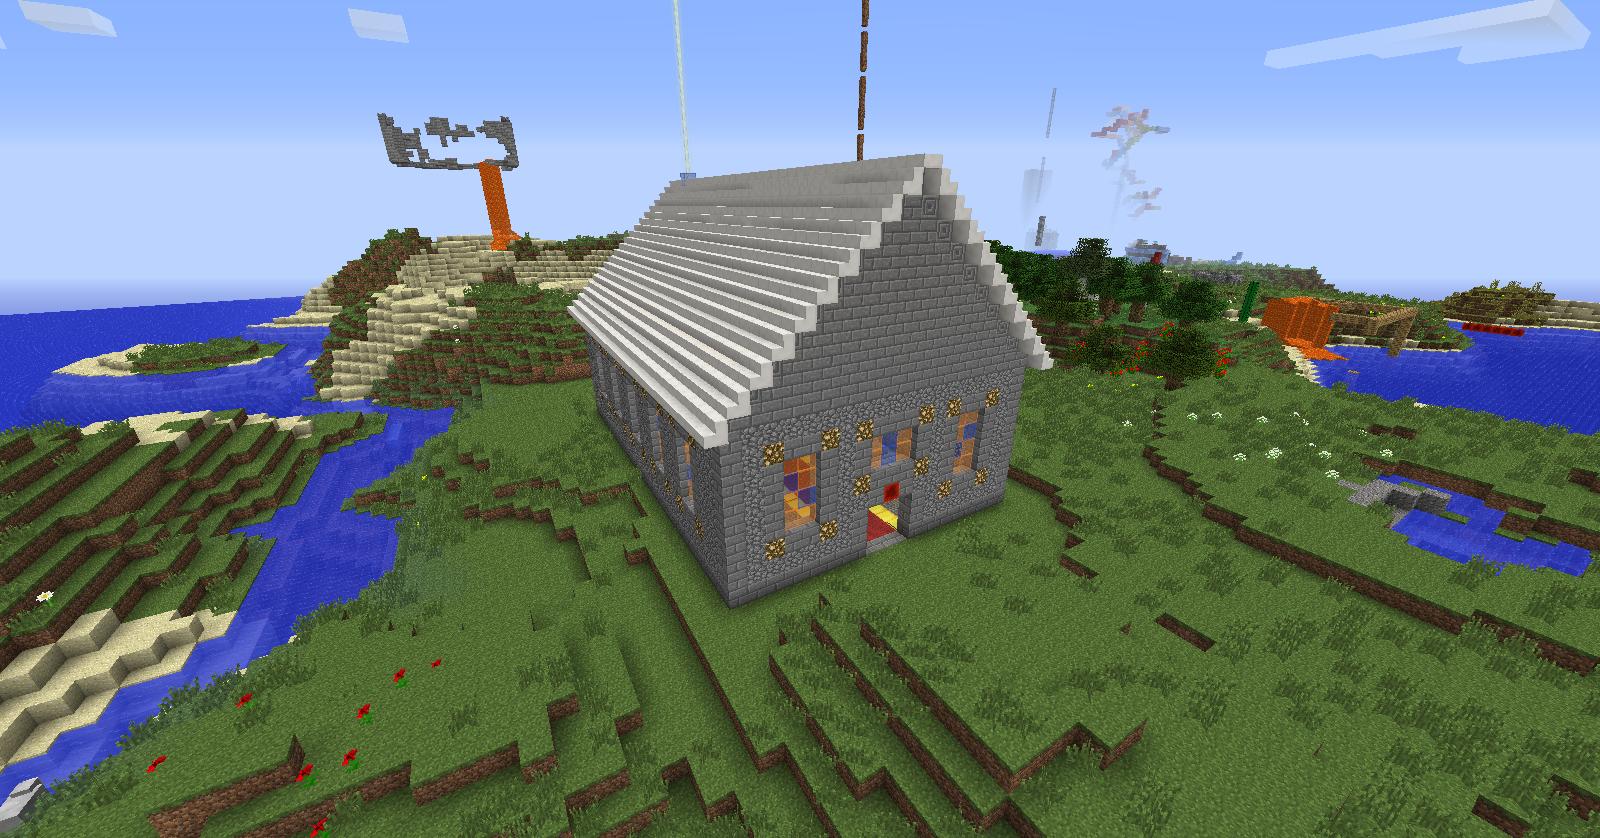 Minecraft: City Construction Challenge - Google Docs